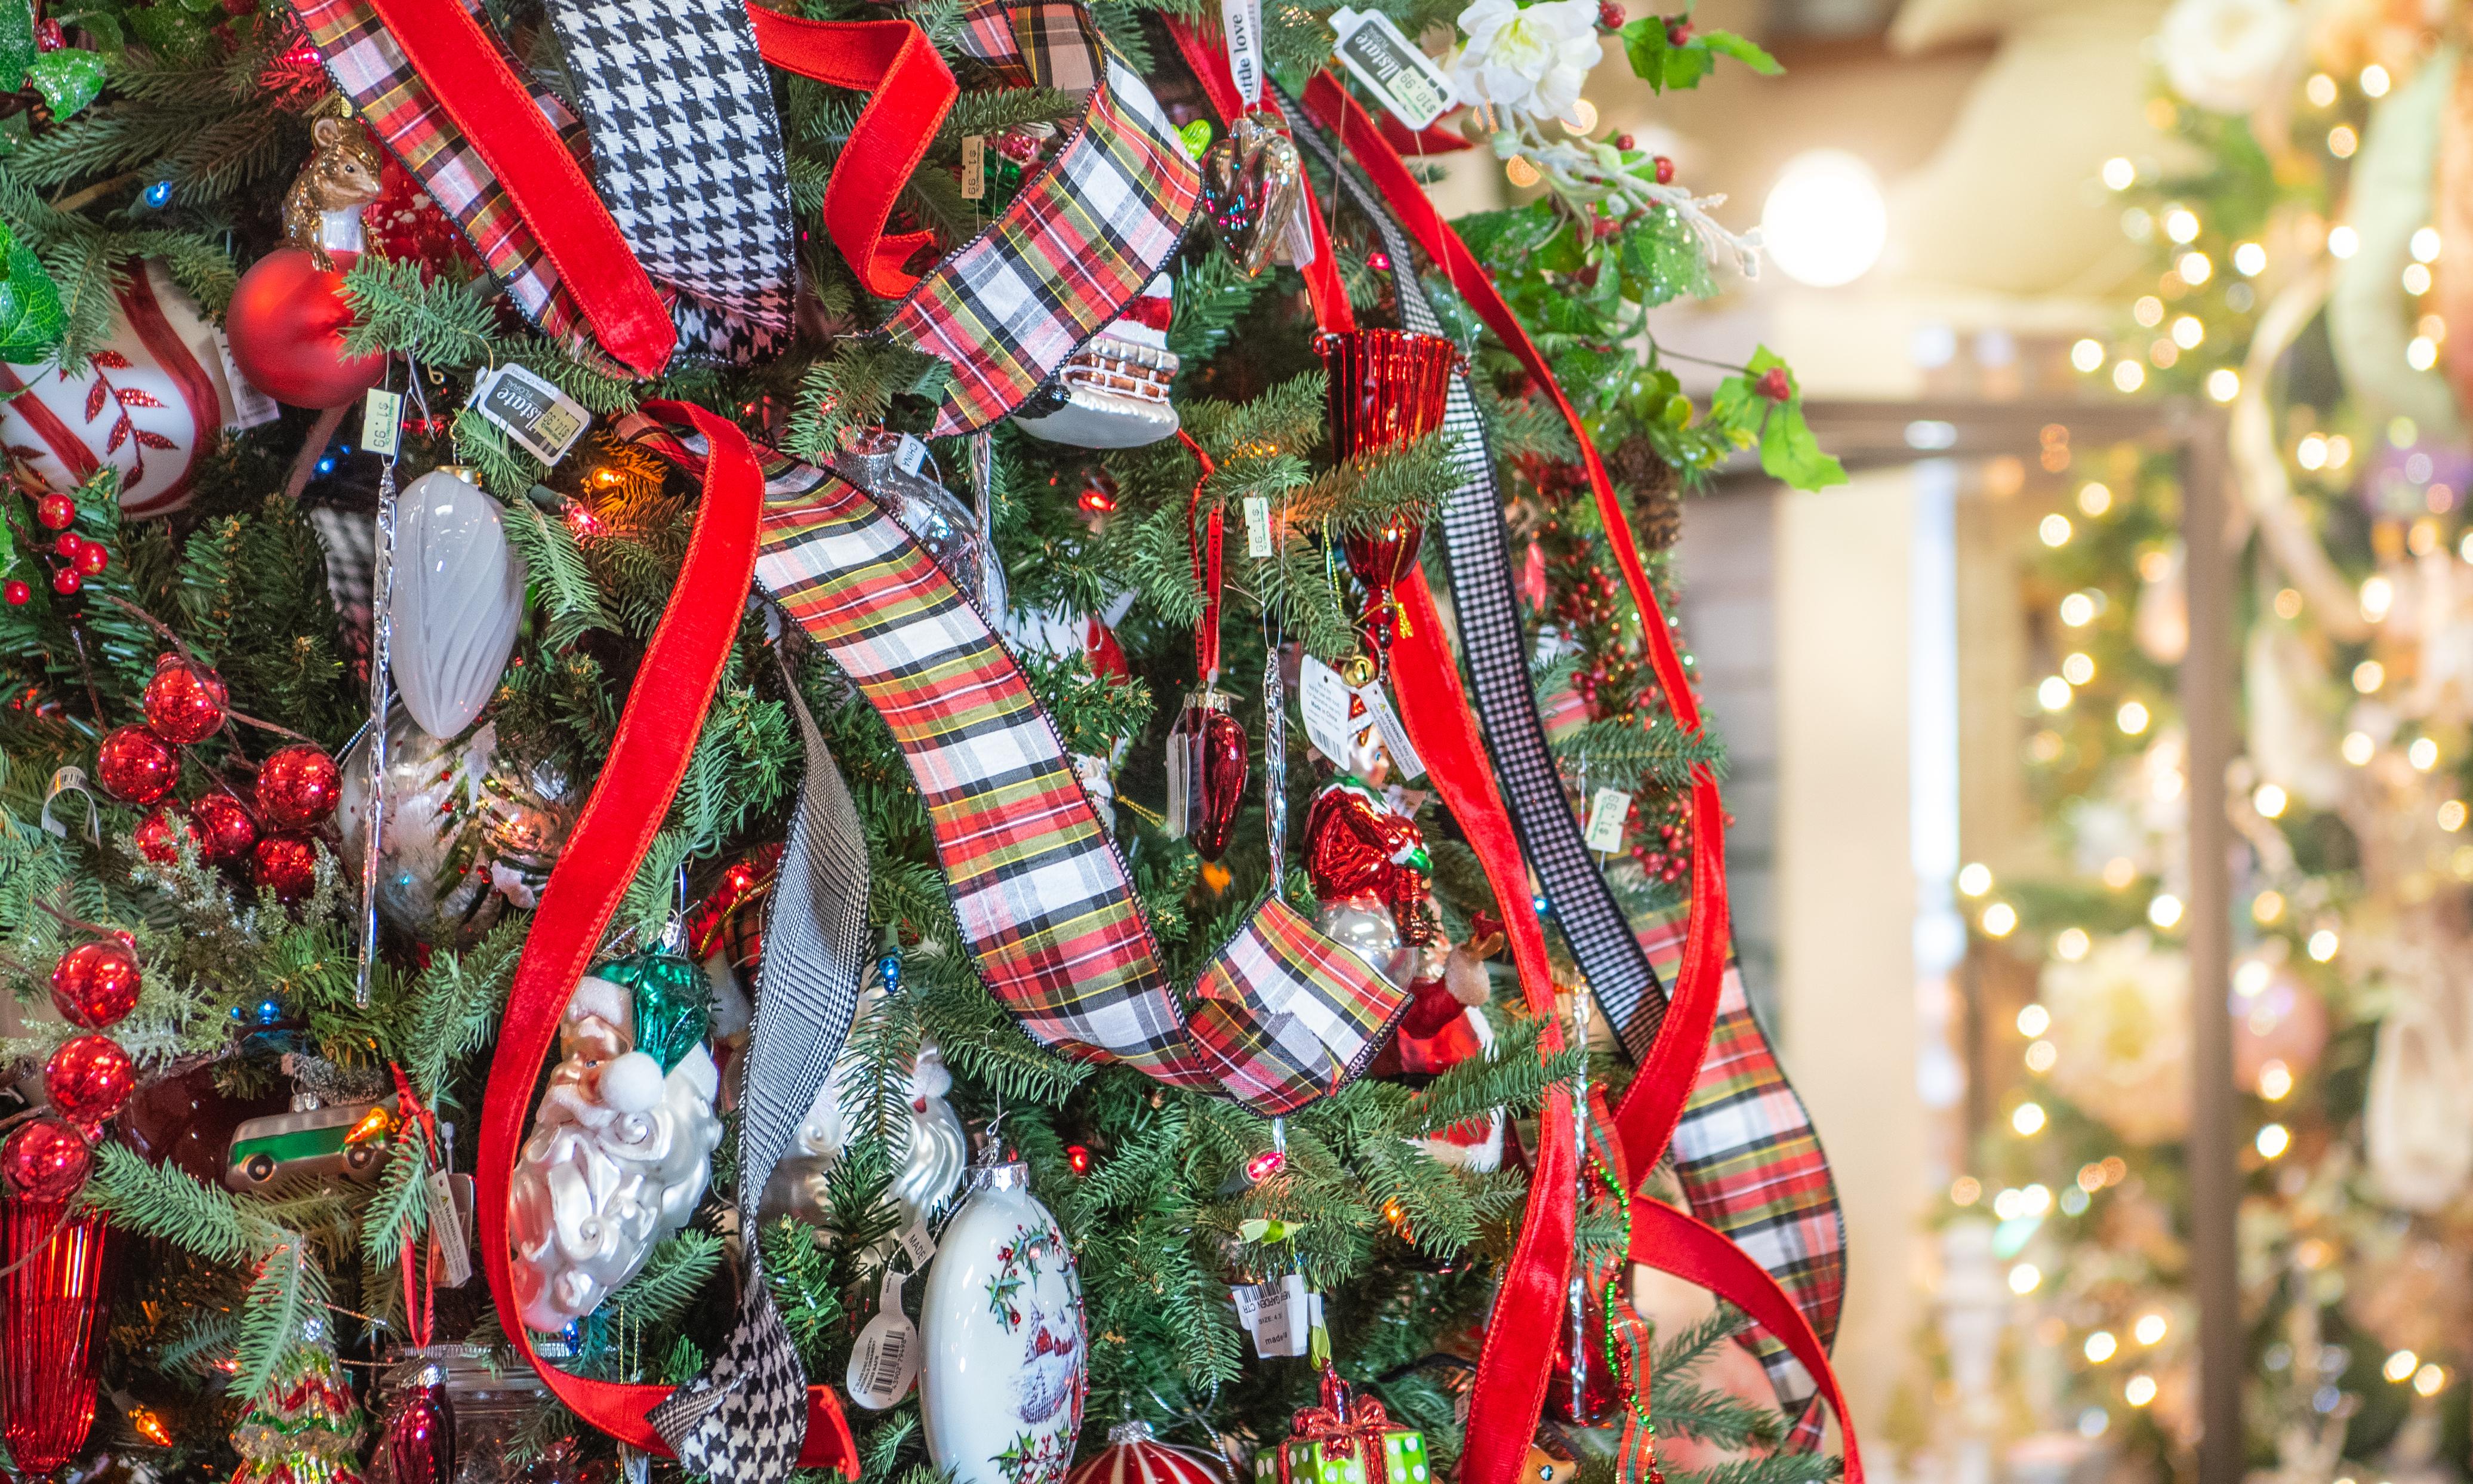 Christmas Tree with Plaid Ribbon, Holiday Shop